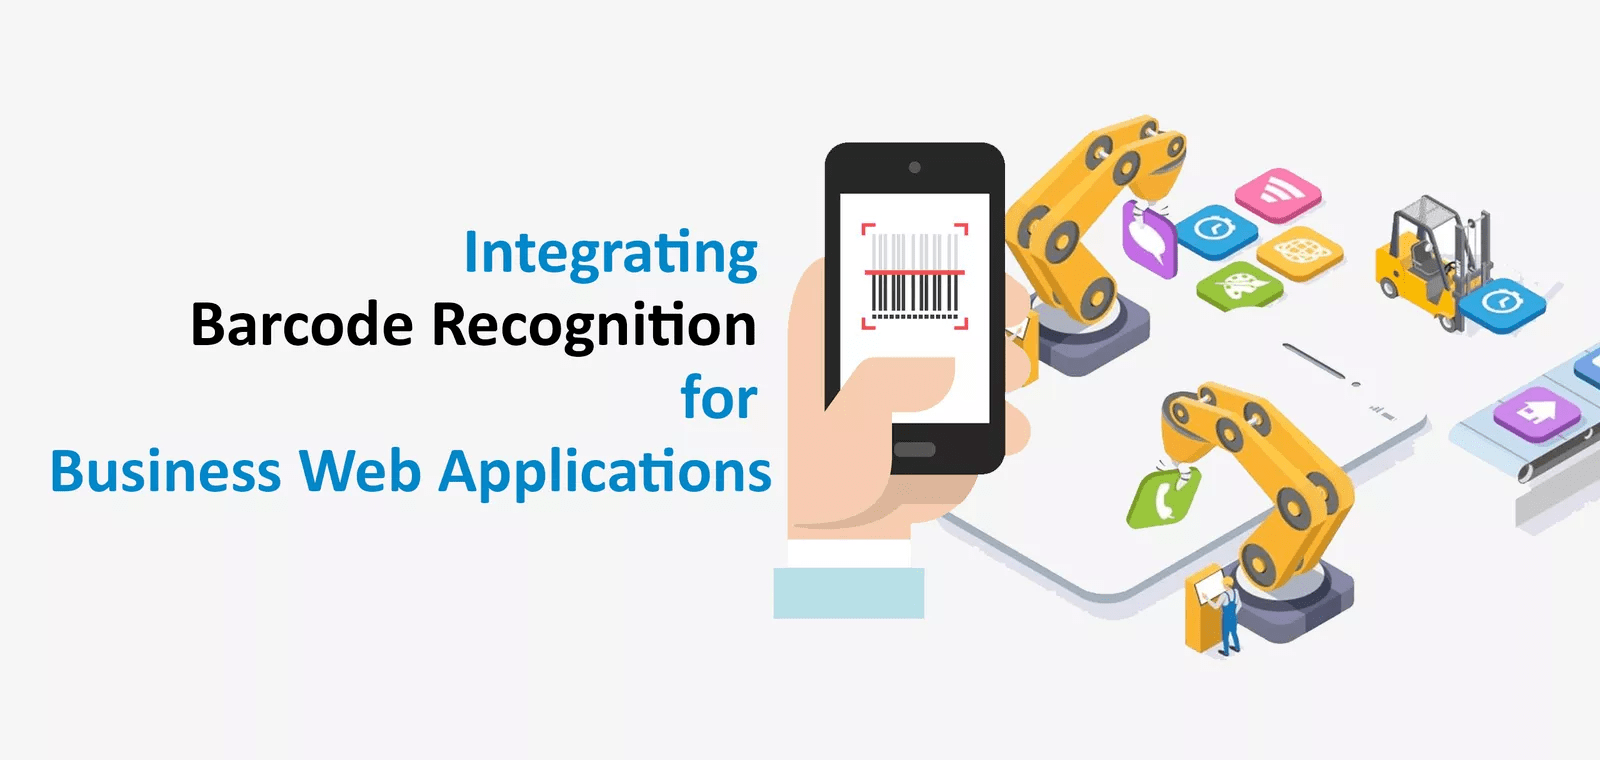 Integrating Barcode Recognition for Business Web Applications | Raidan.com.au